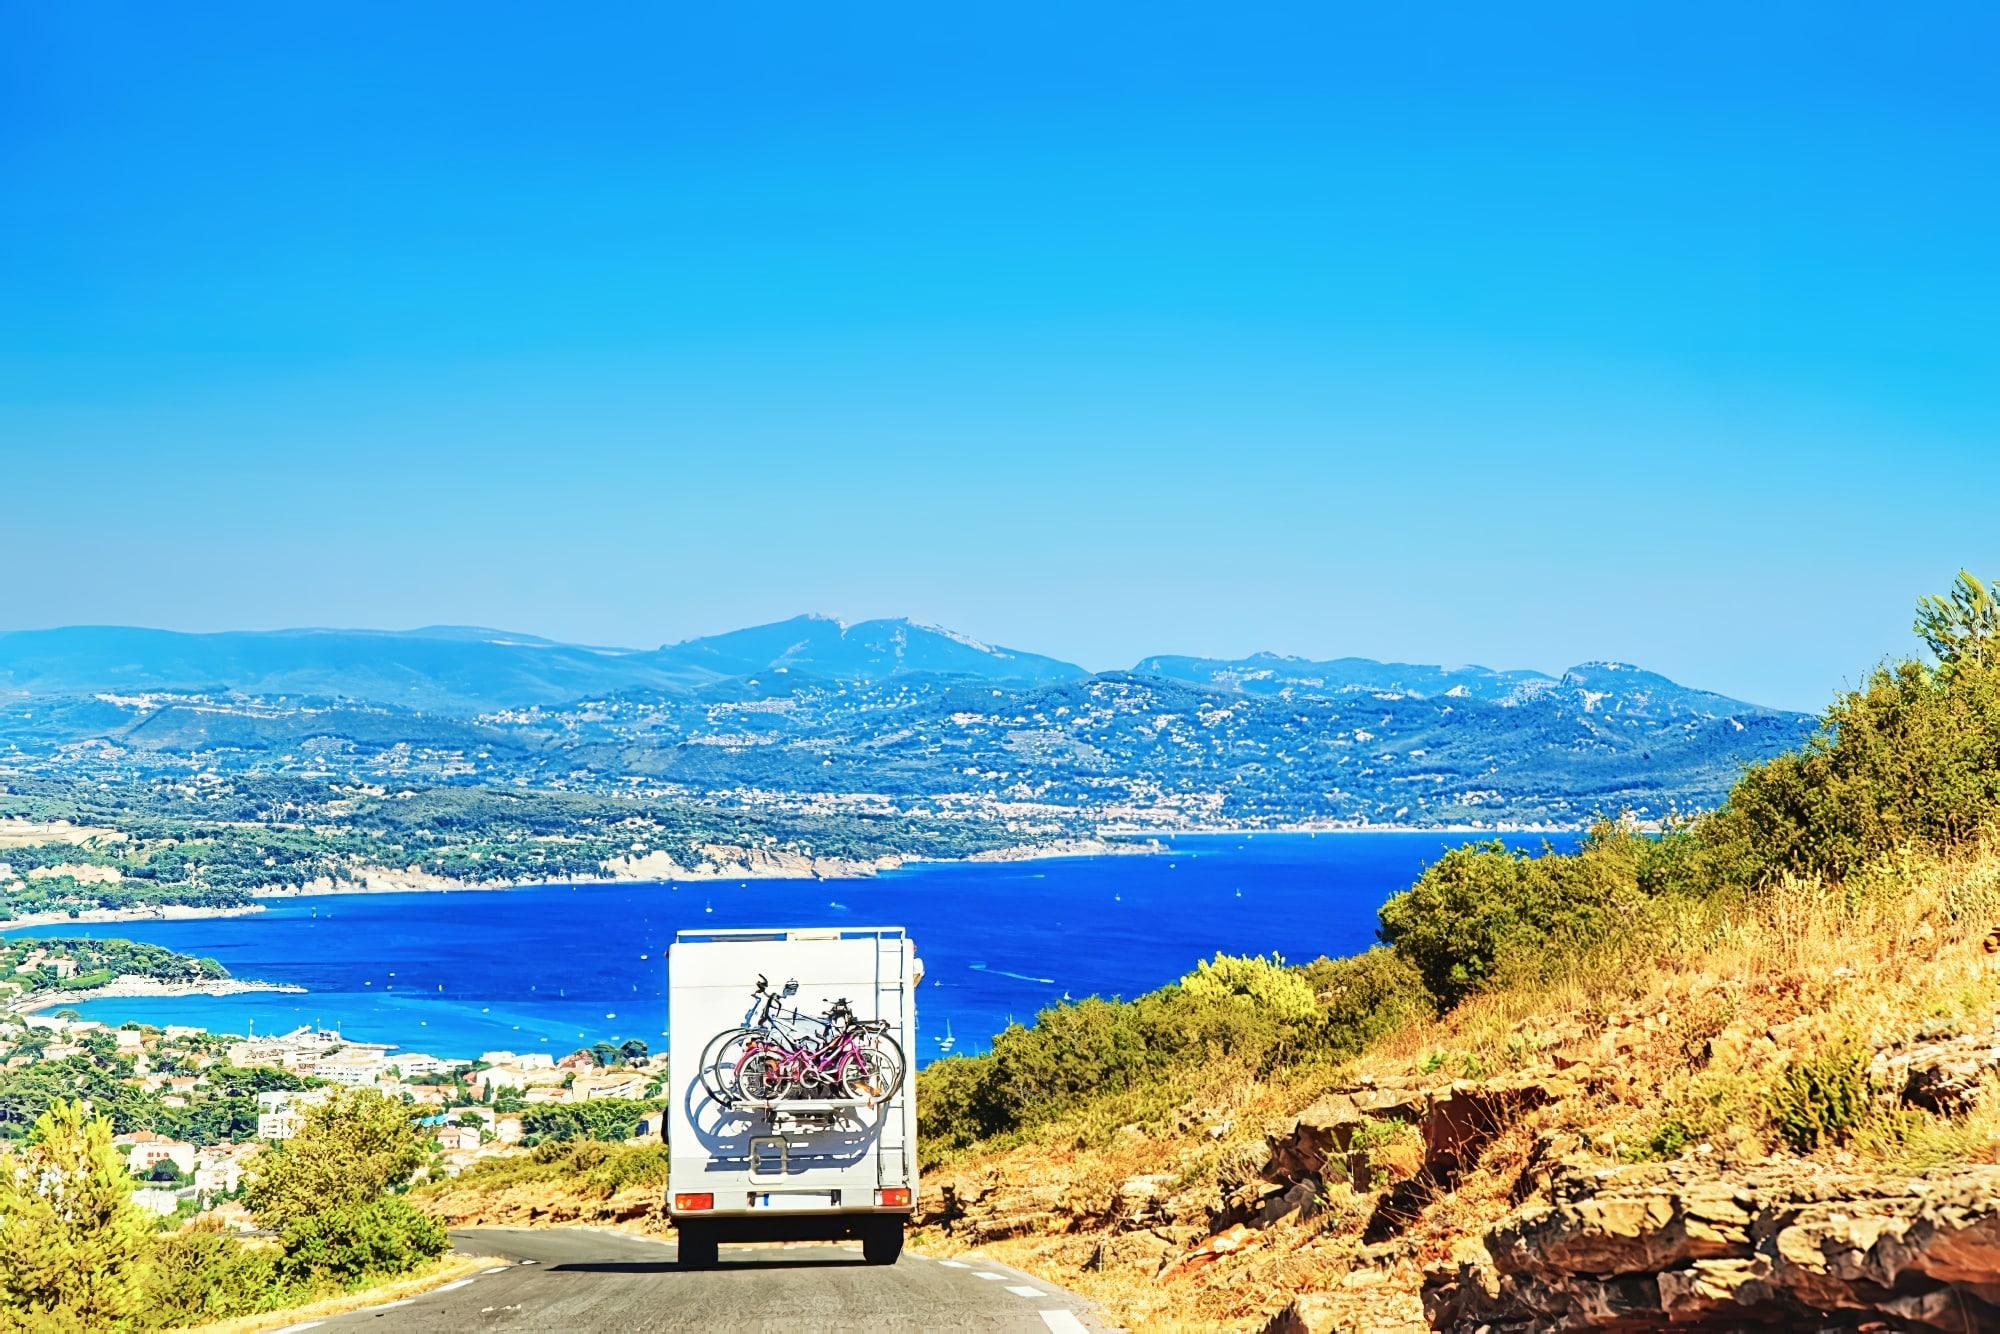 Vacances en France : roadtrip en Provence